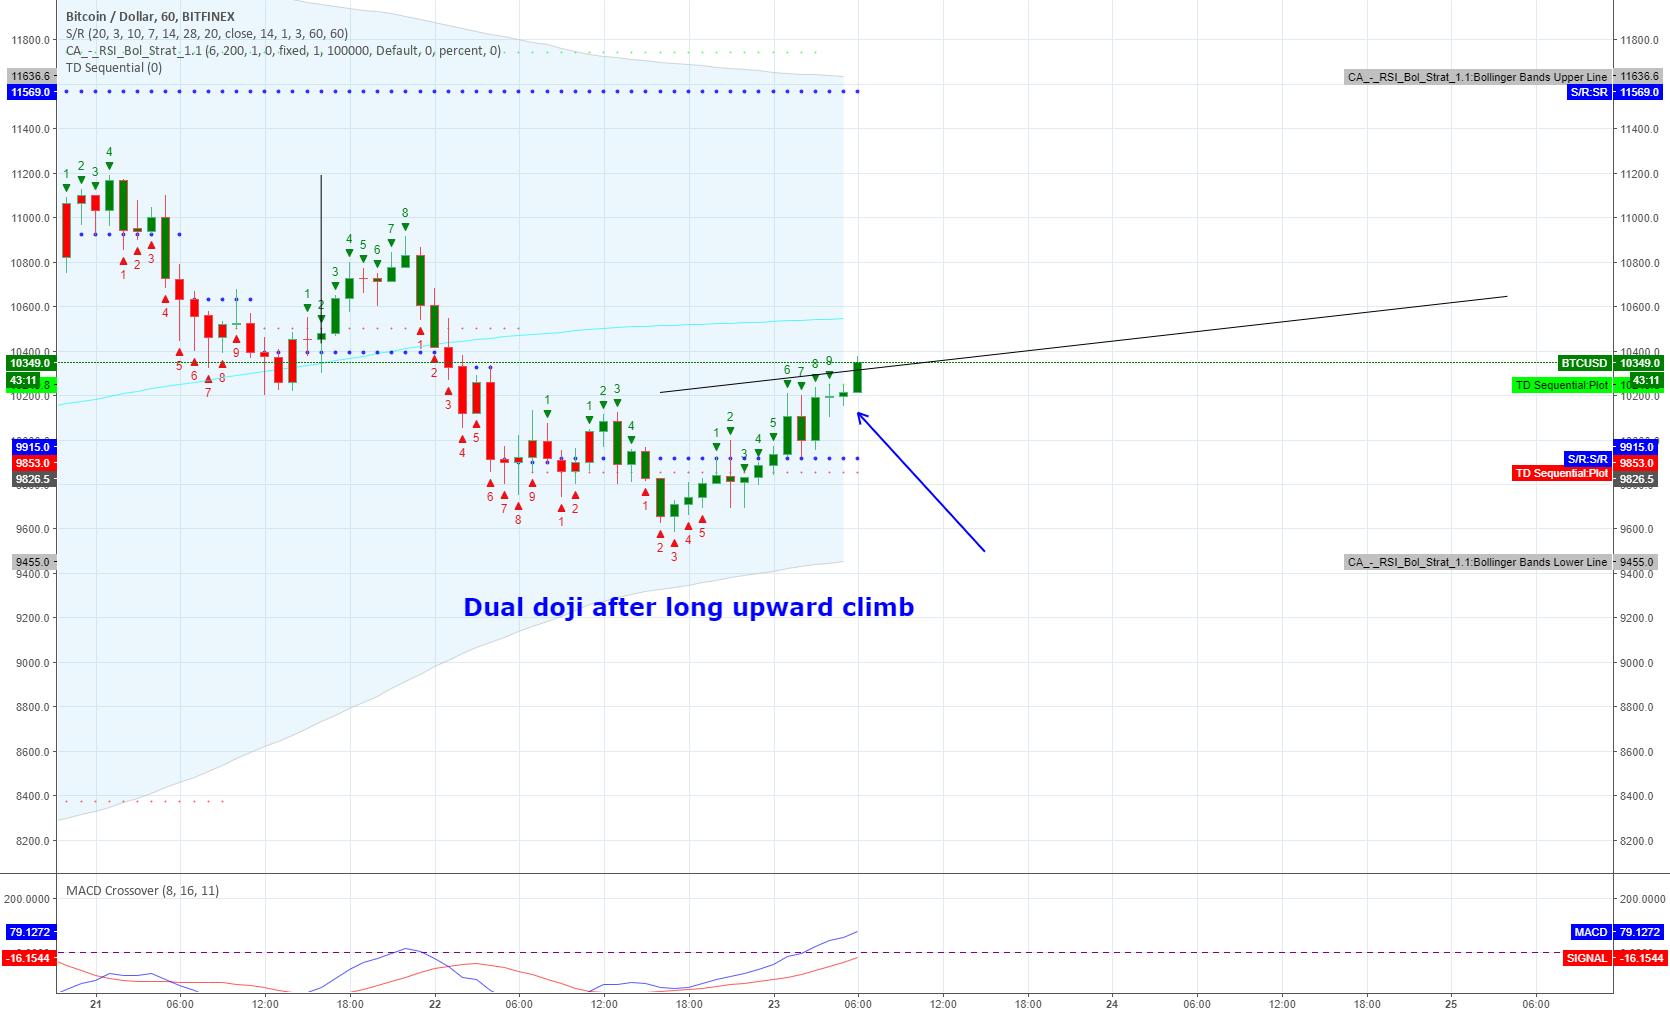 Dual doji after long upward climb - trend reversal